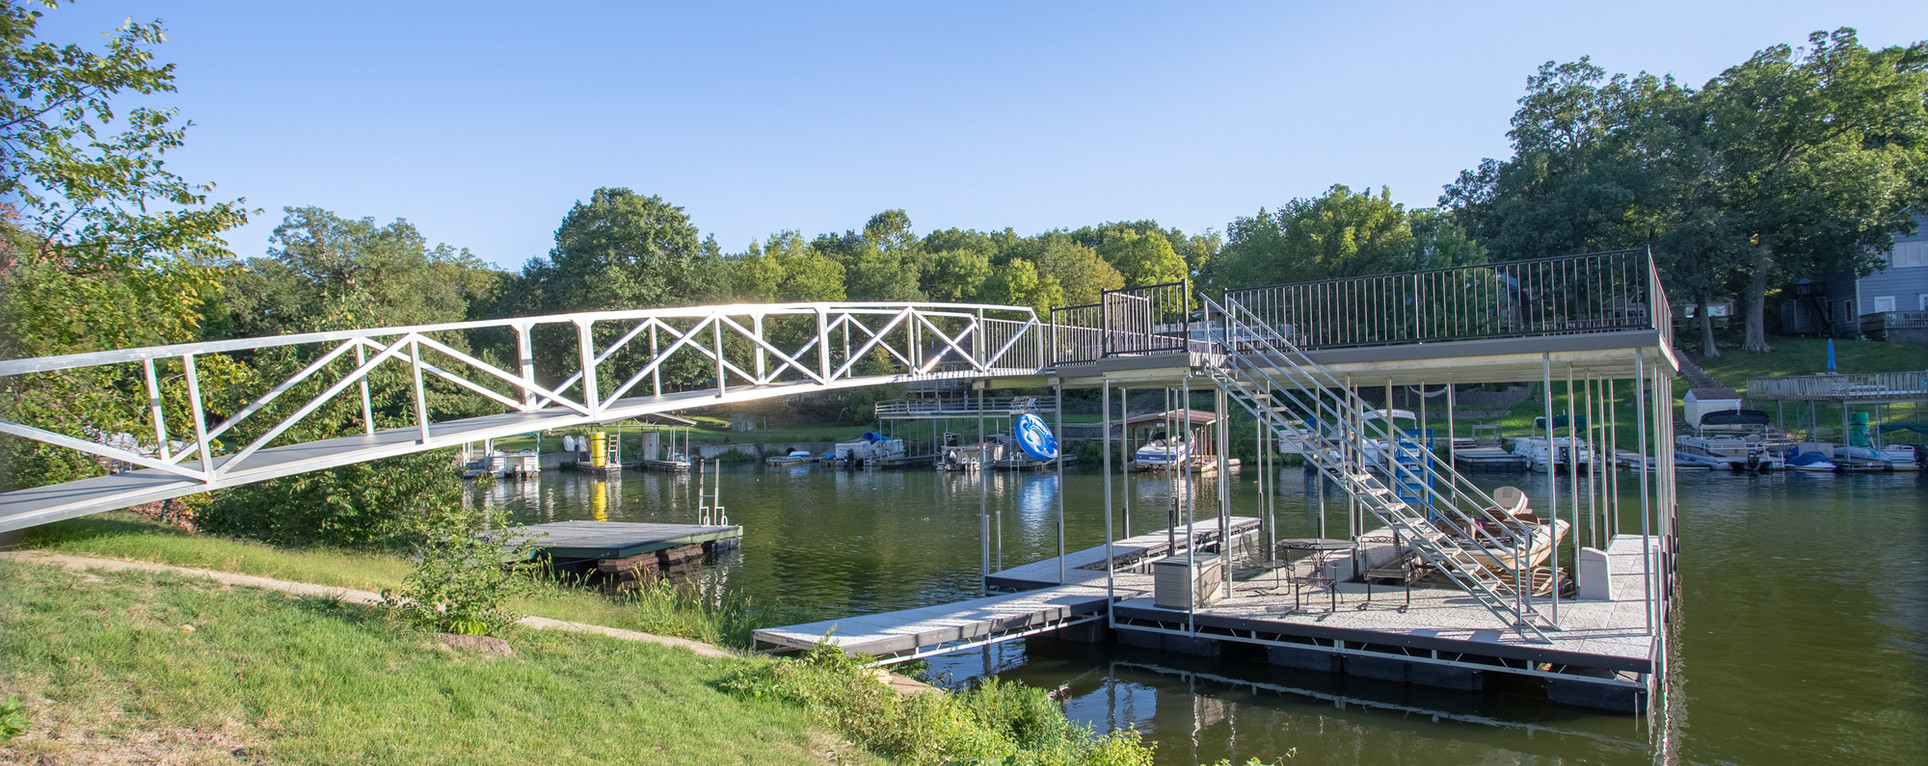 dock117.jpg